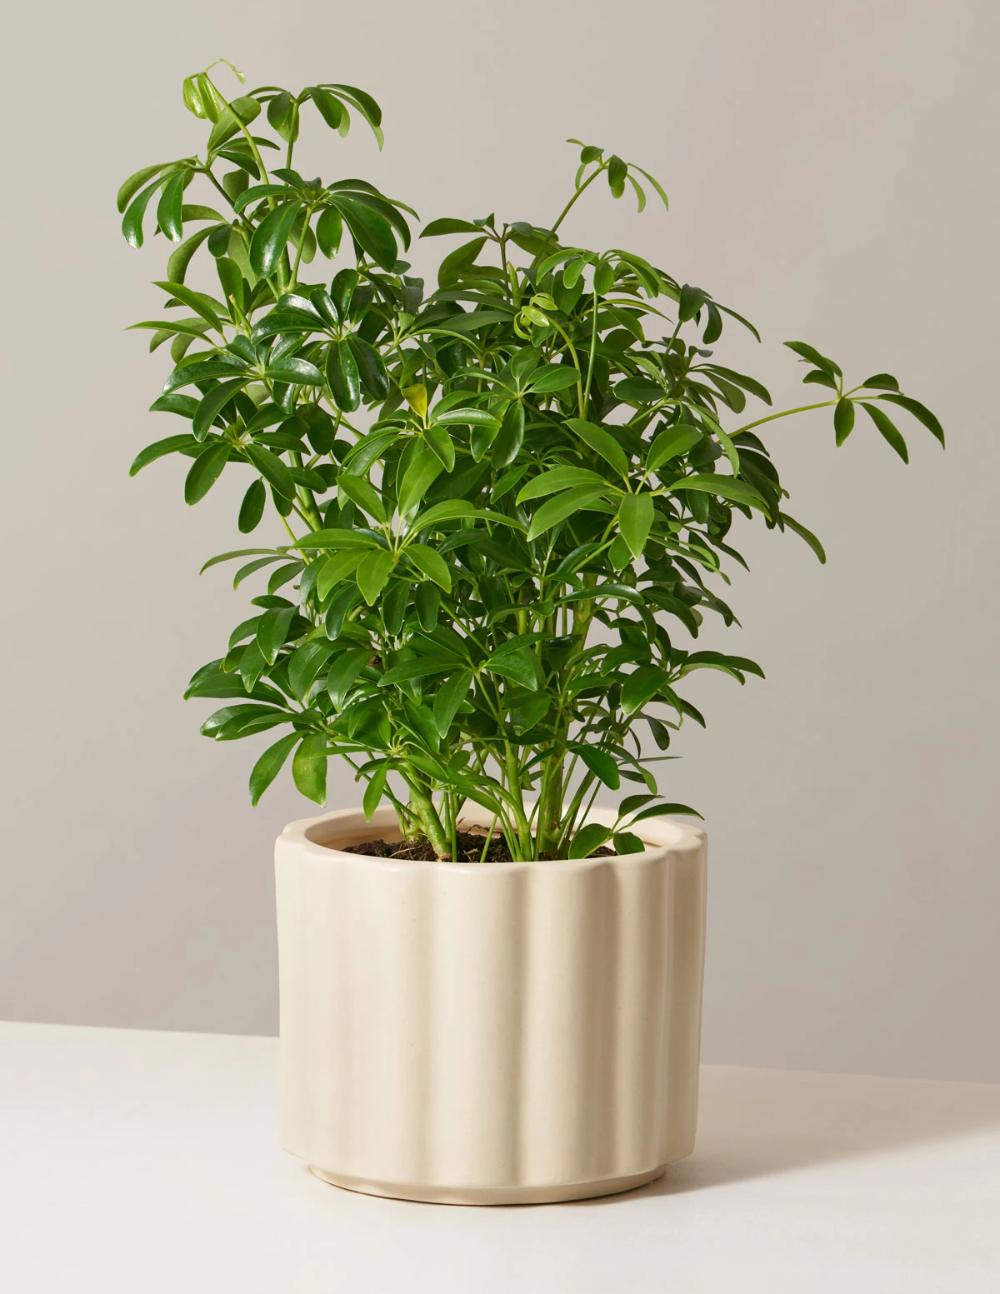 Schefflera Schefflera Plant Care Houseplant Money Tree Plant Care